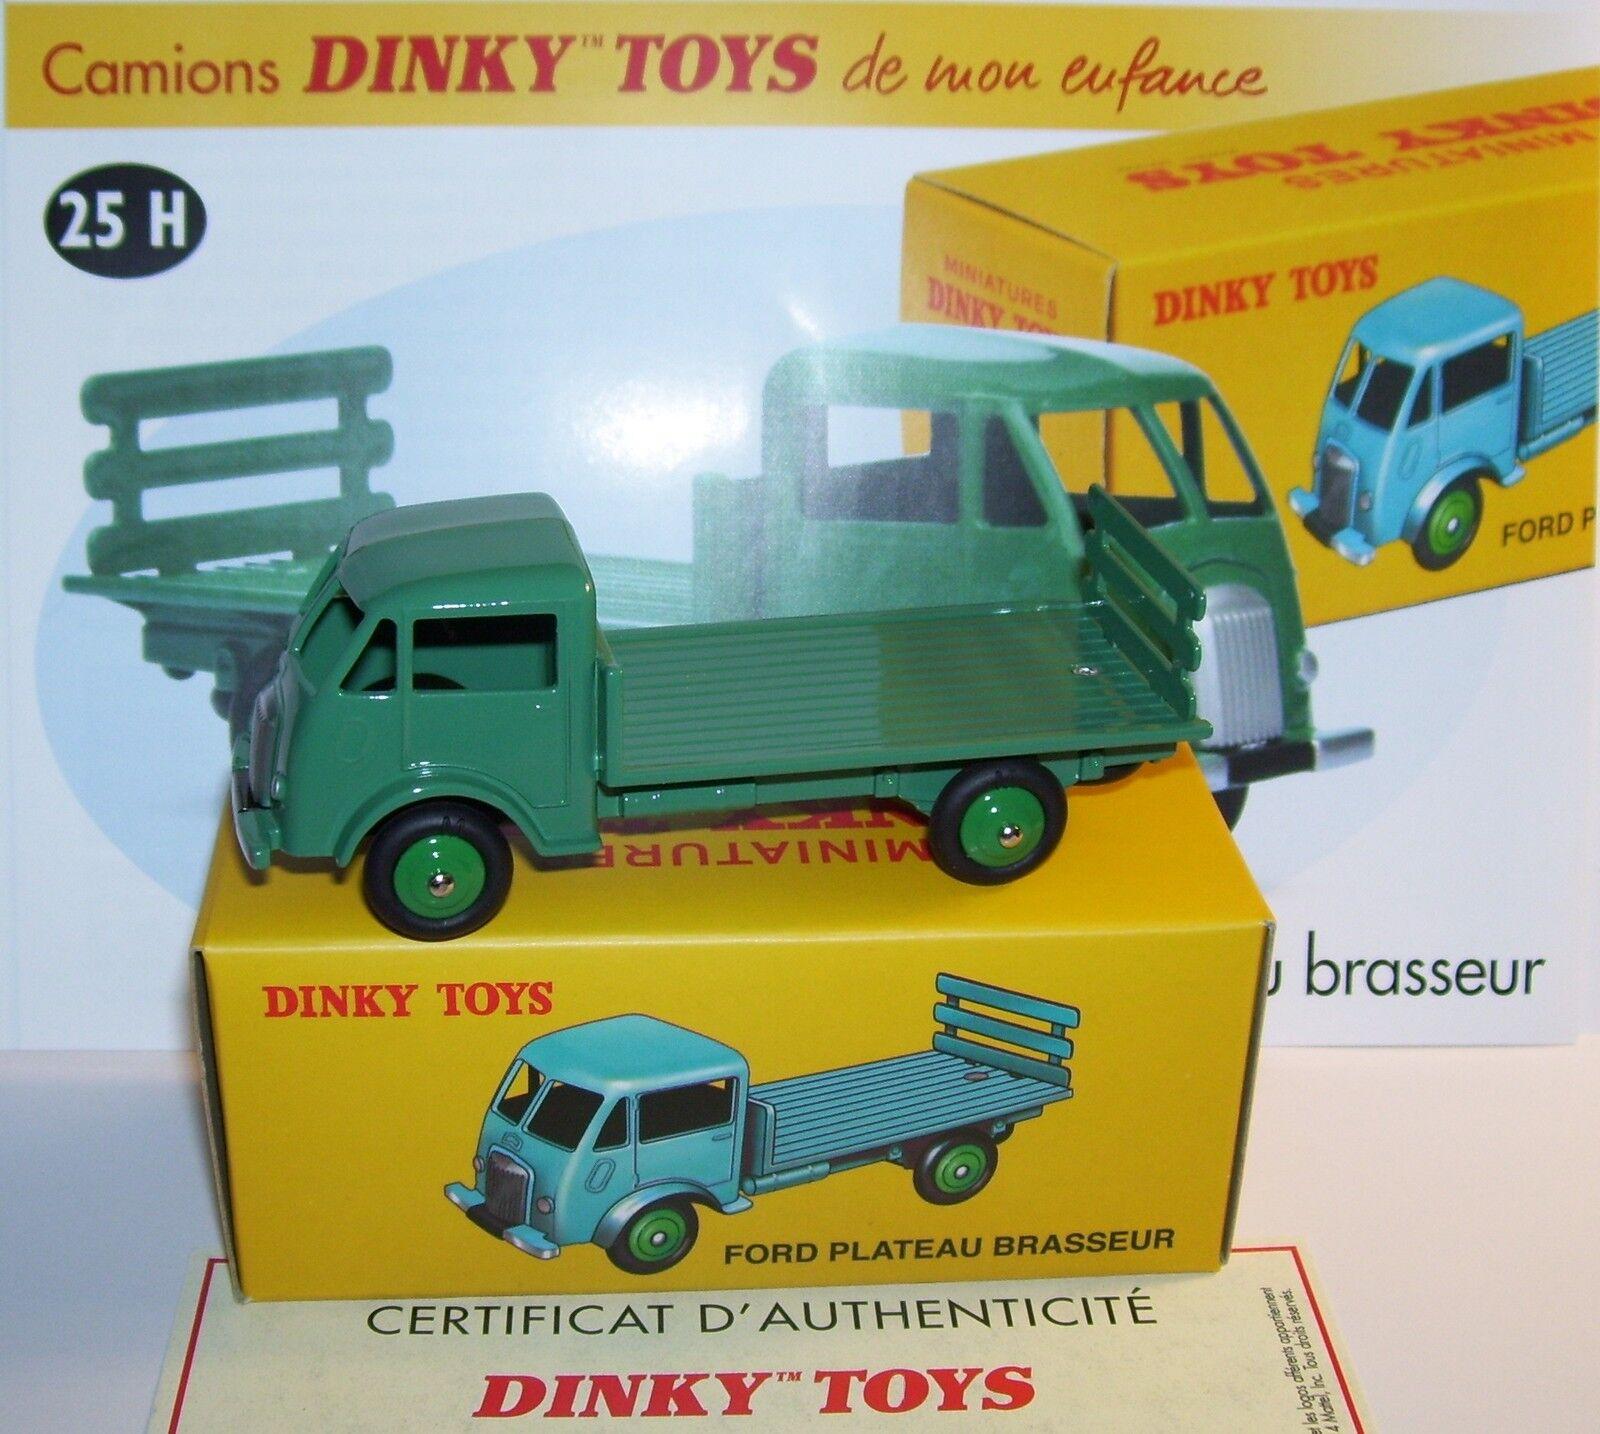 REEDITION DINKY TOYS ATLAS FORD PLATEAU BRASSEUR REF 25 H VERT IN BOX